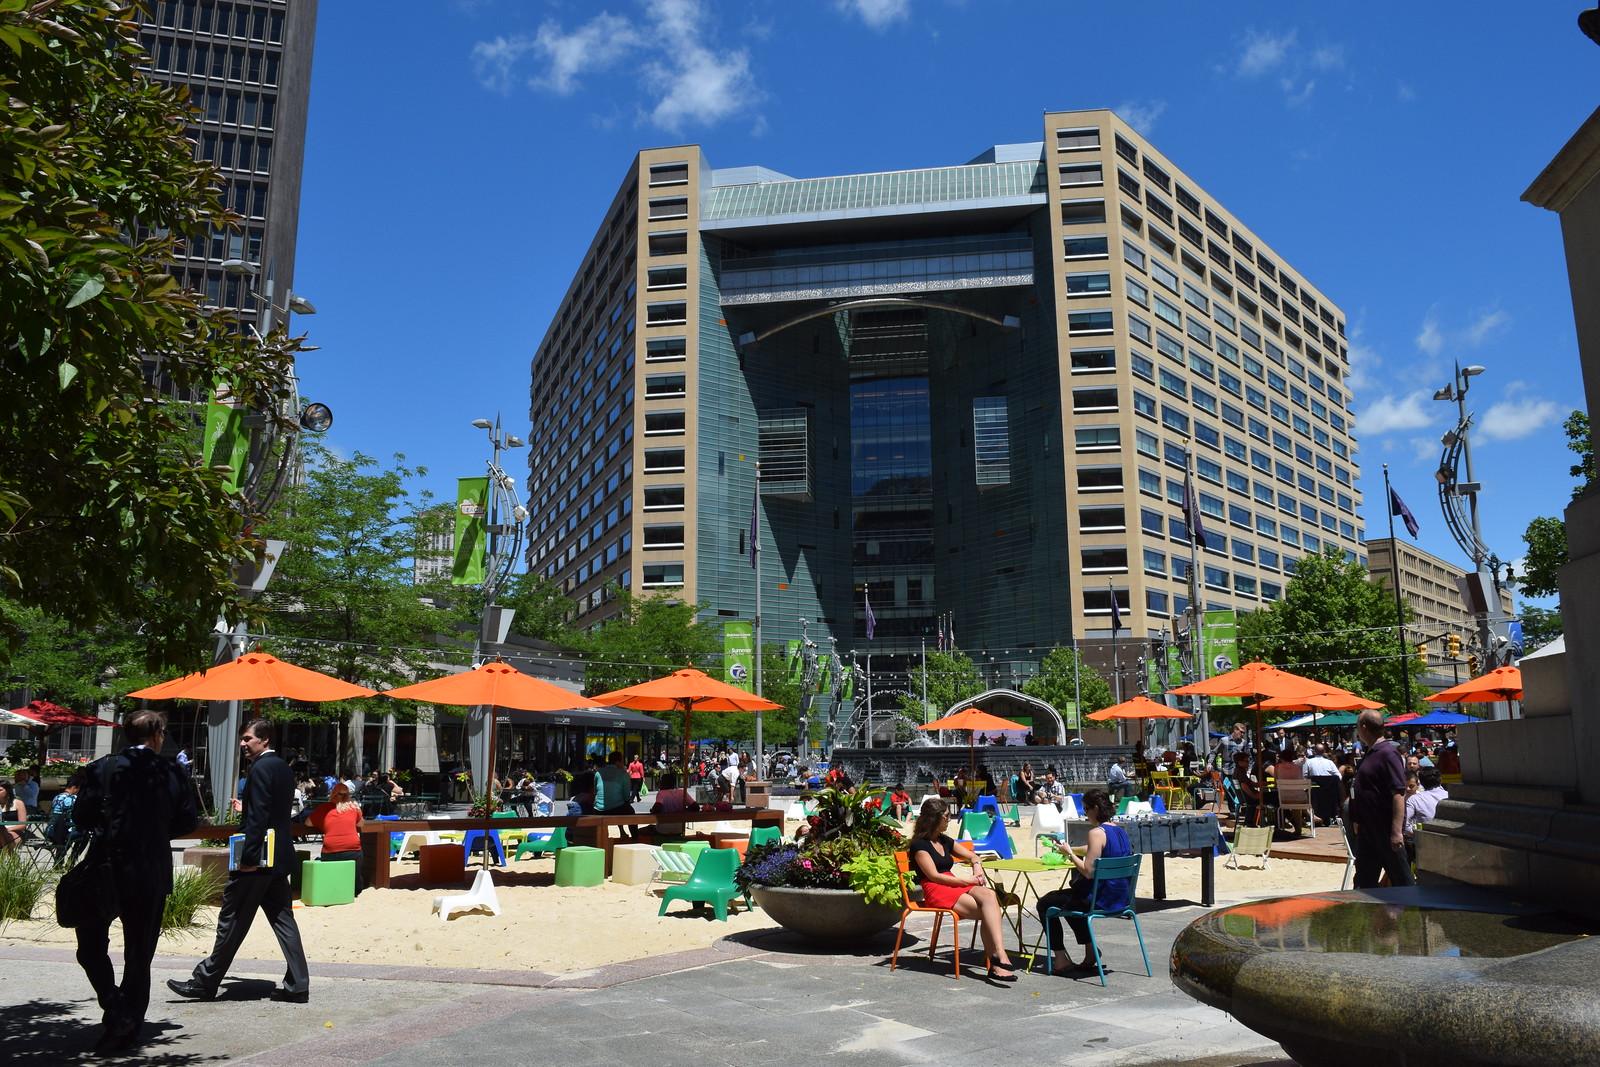 Detroit's Campus Martius Park: Placemaking in Action June 2015